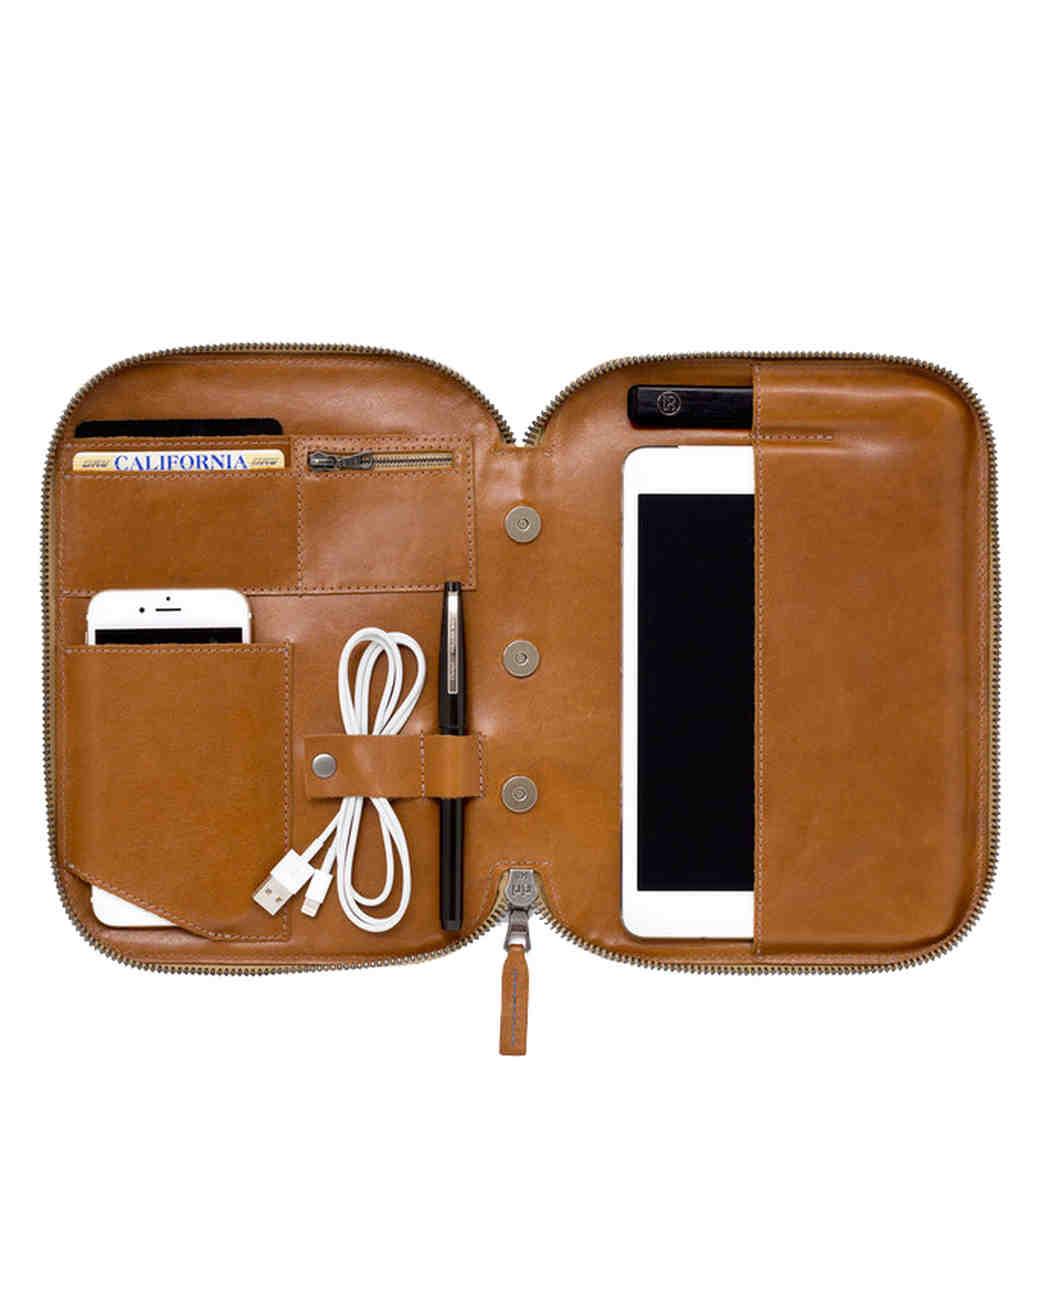 fathers-gift-guide-tech-ipad-case-0515.jpg